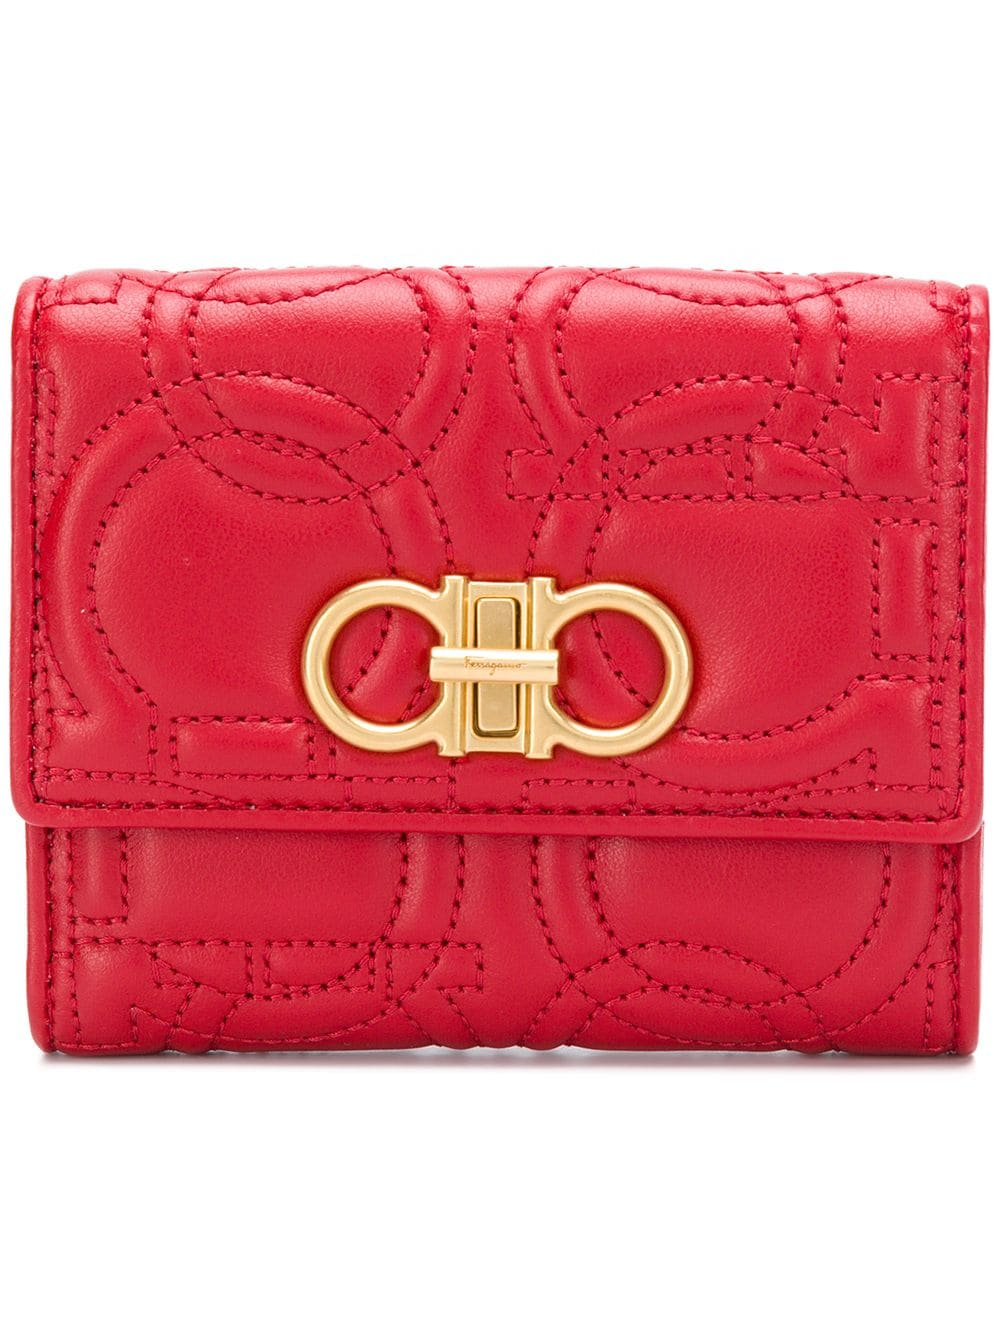 Gancino Quilting Leatehr Wallet